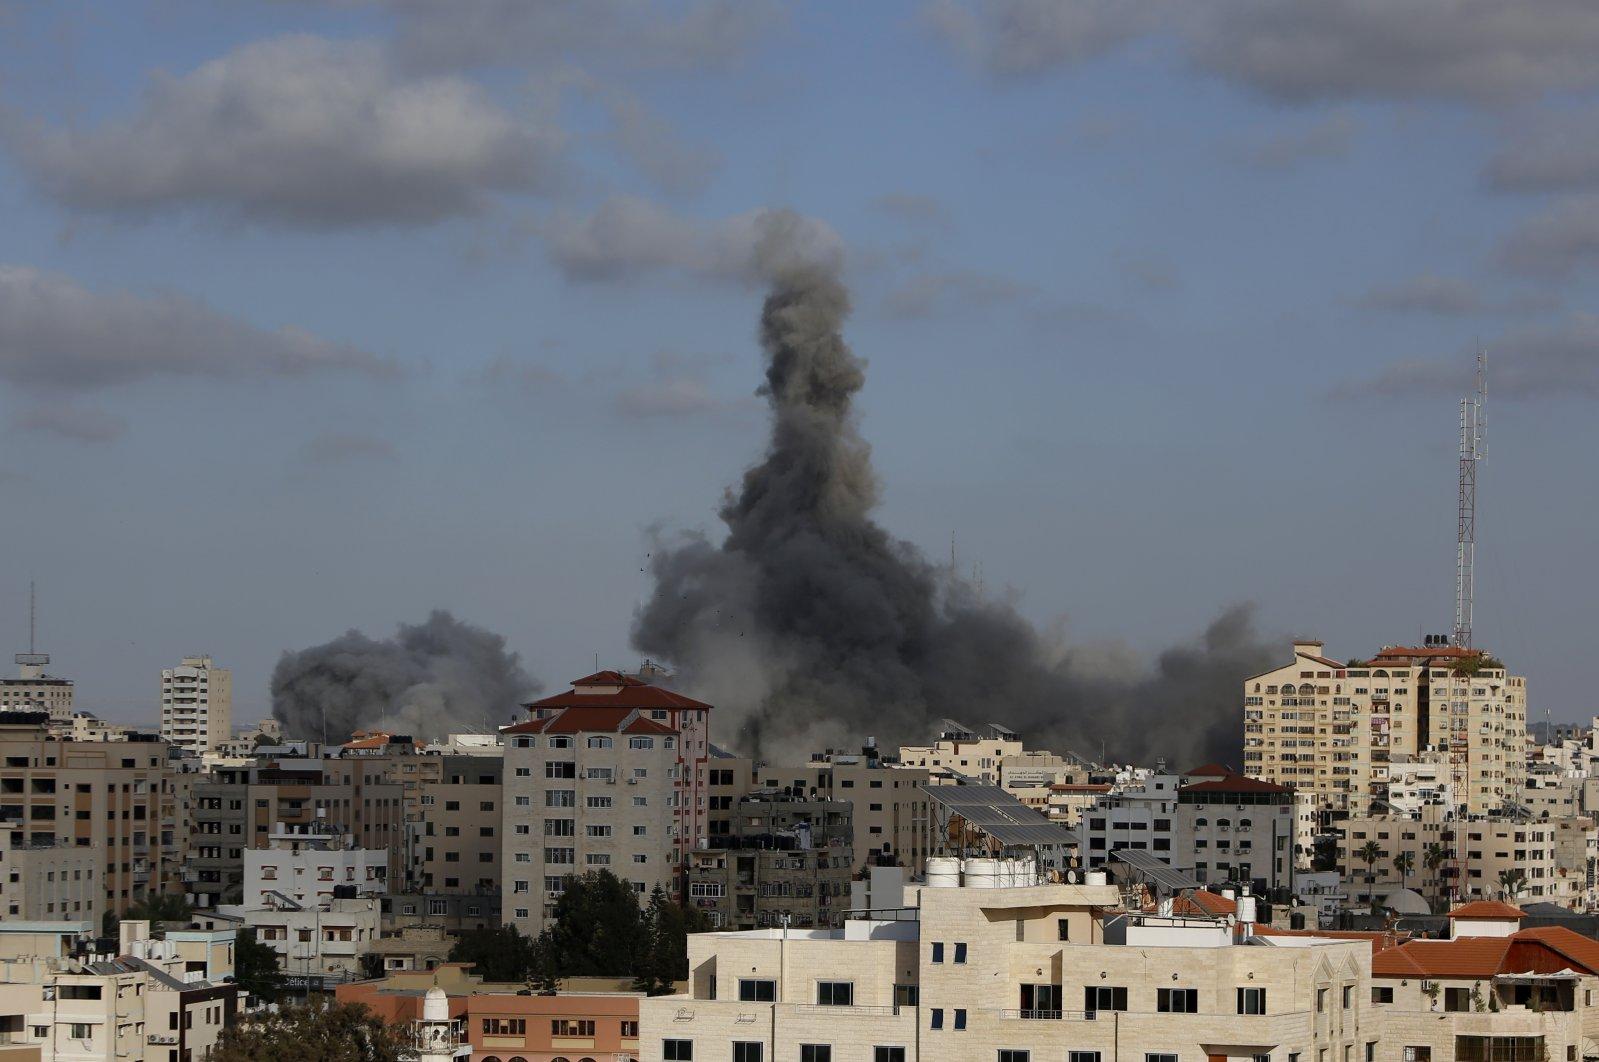 An Israeli airstrike hits a building in Gaza City, May 17, 2021. (AP Photo)